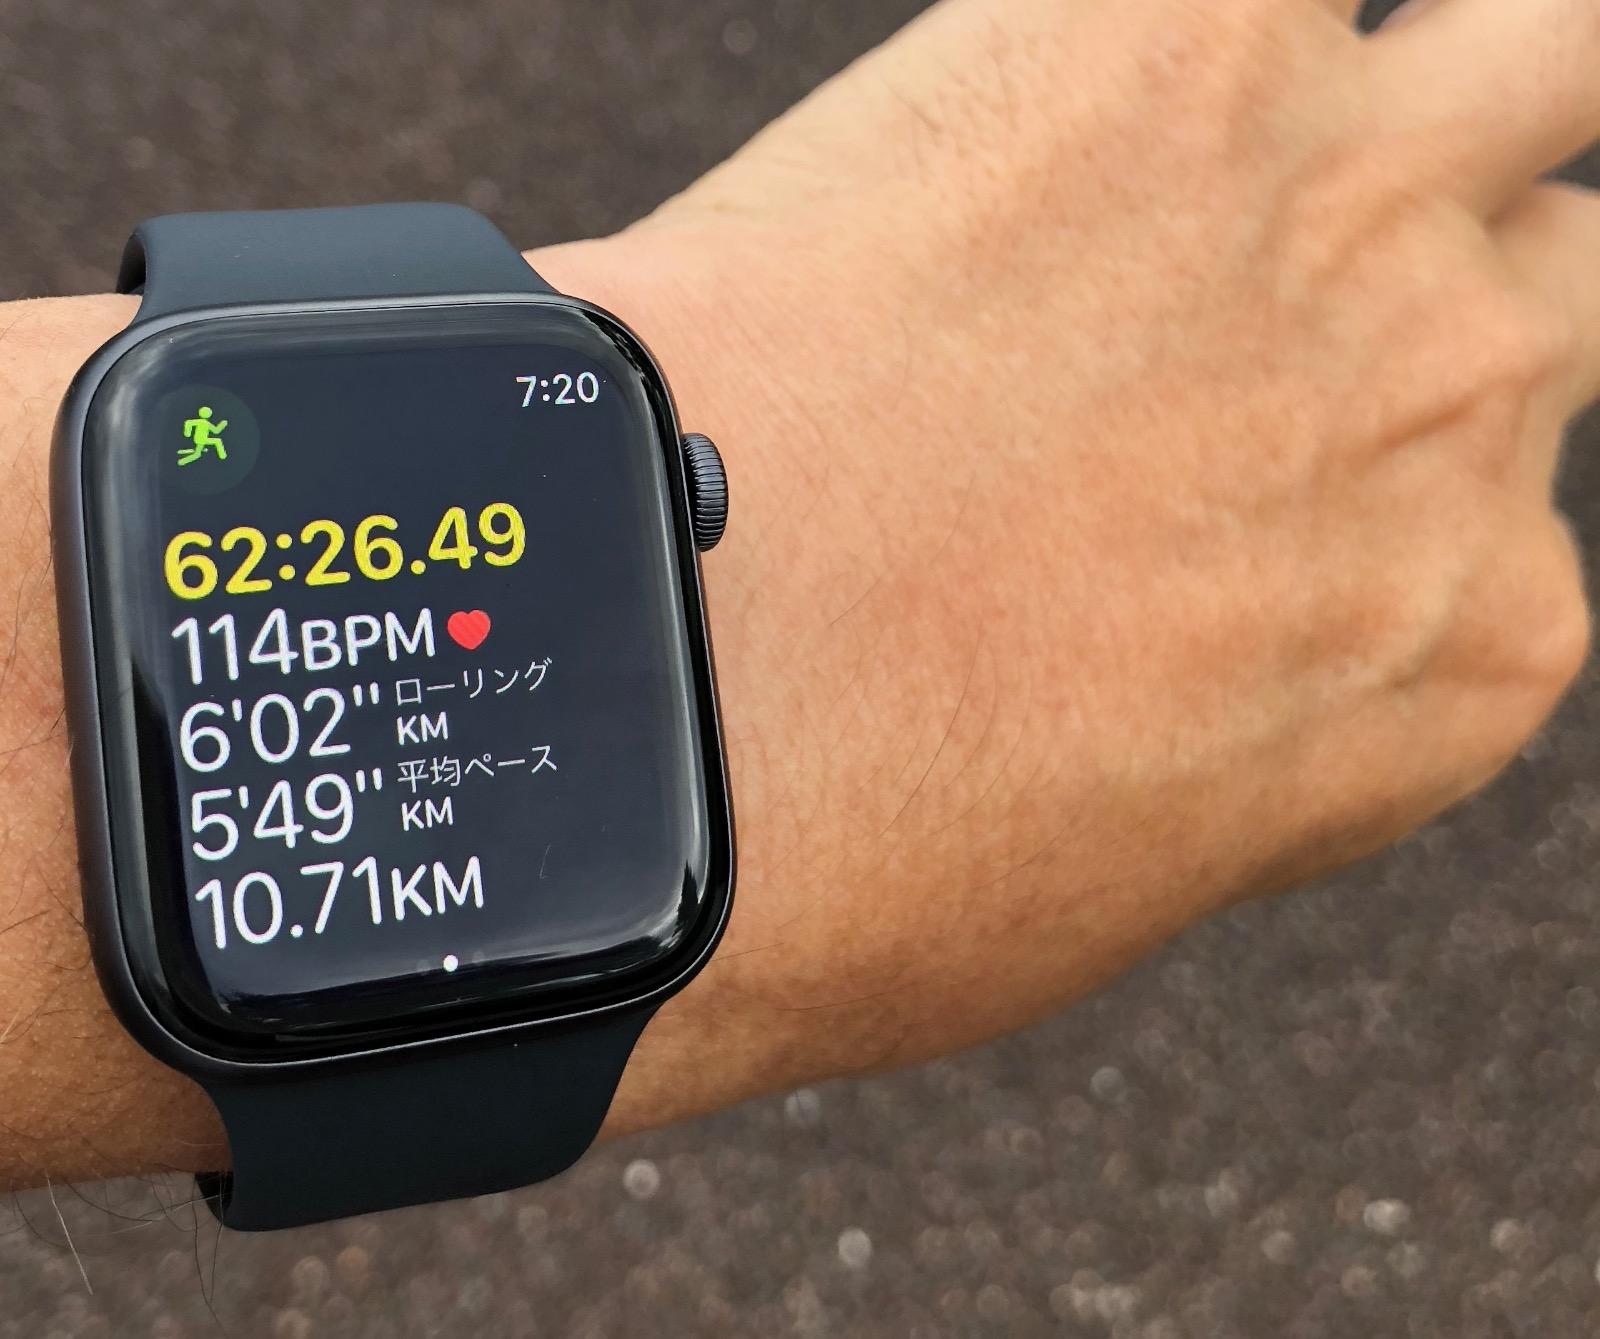 [Apple Watch]新型「Apple Watch Series 4」を装着しランニング時に感じたこと